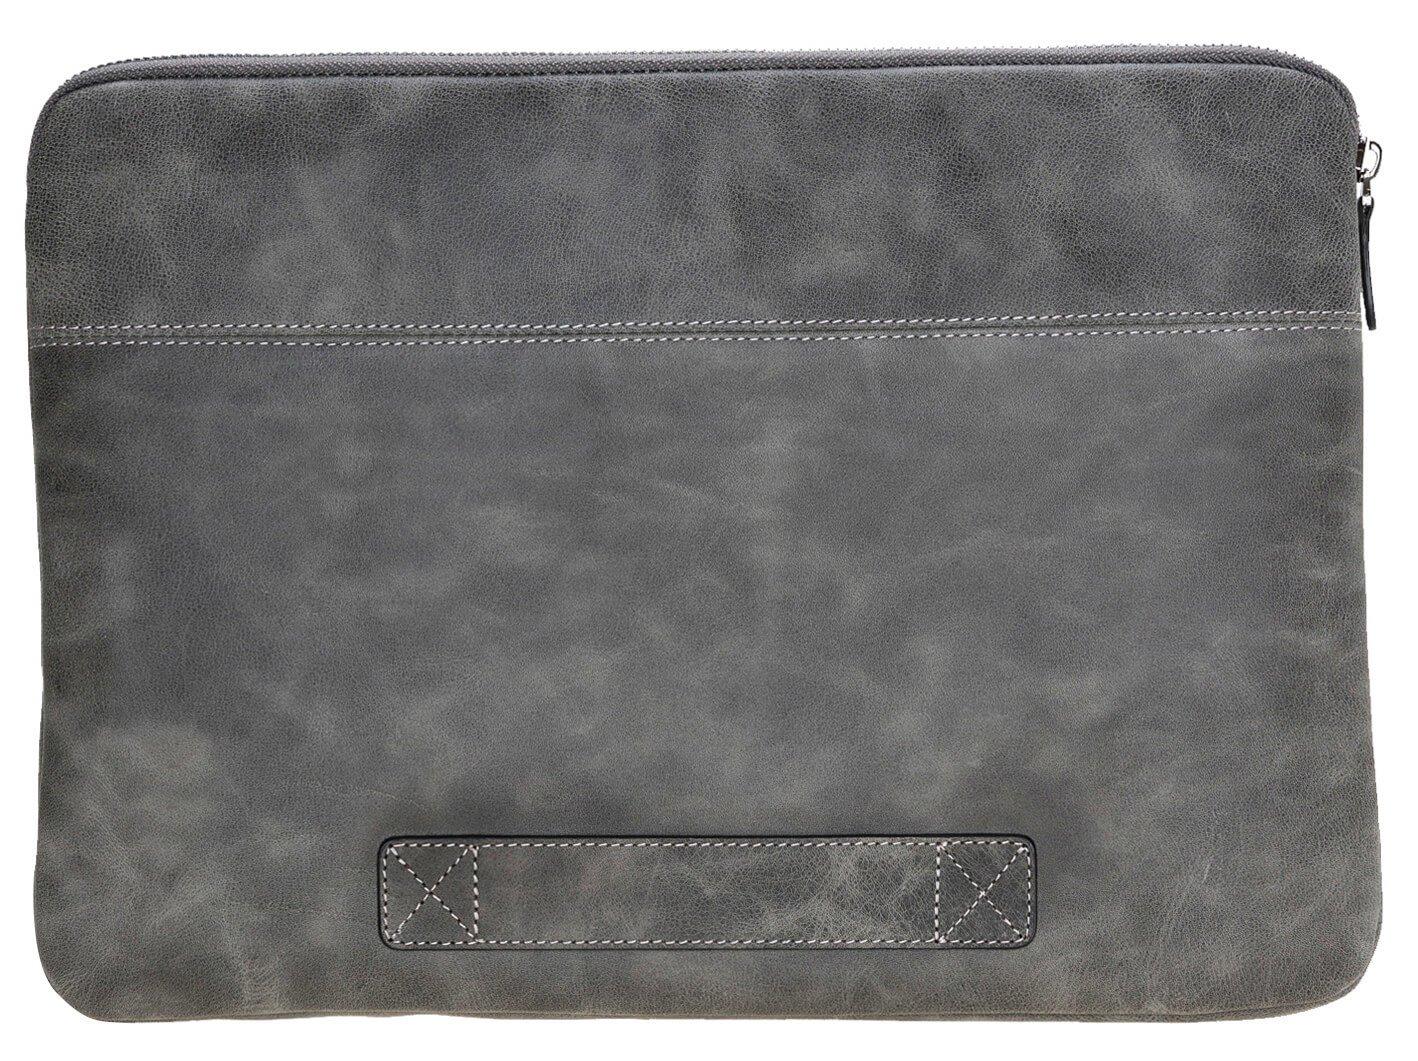 Solo Pelle Ledertasche für das Apple MacBook Pro und Air 13 Zoll, 12 Zoll & iPad Pro 12,9 Zoll Lederhülle Case Hülle Awenta aus echtem Leder in Steingrau